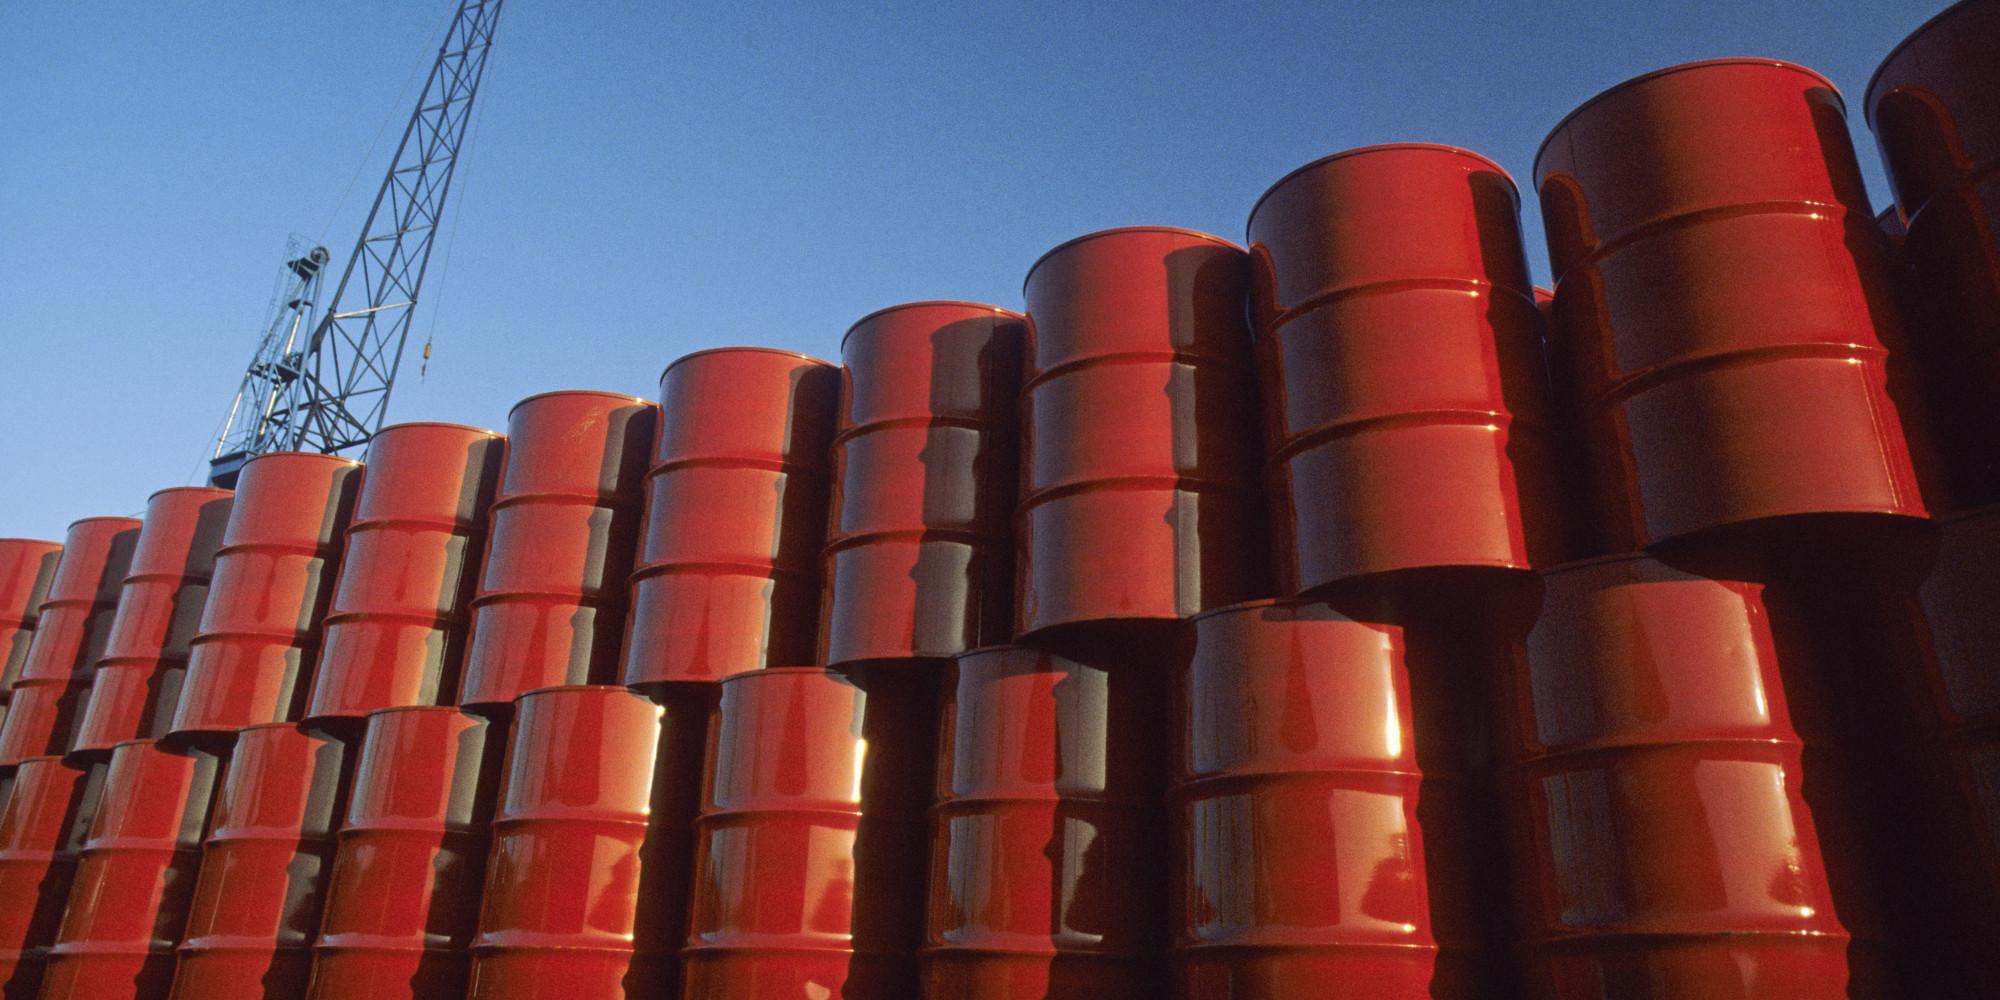 Red metal barrels against blue sky.